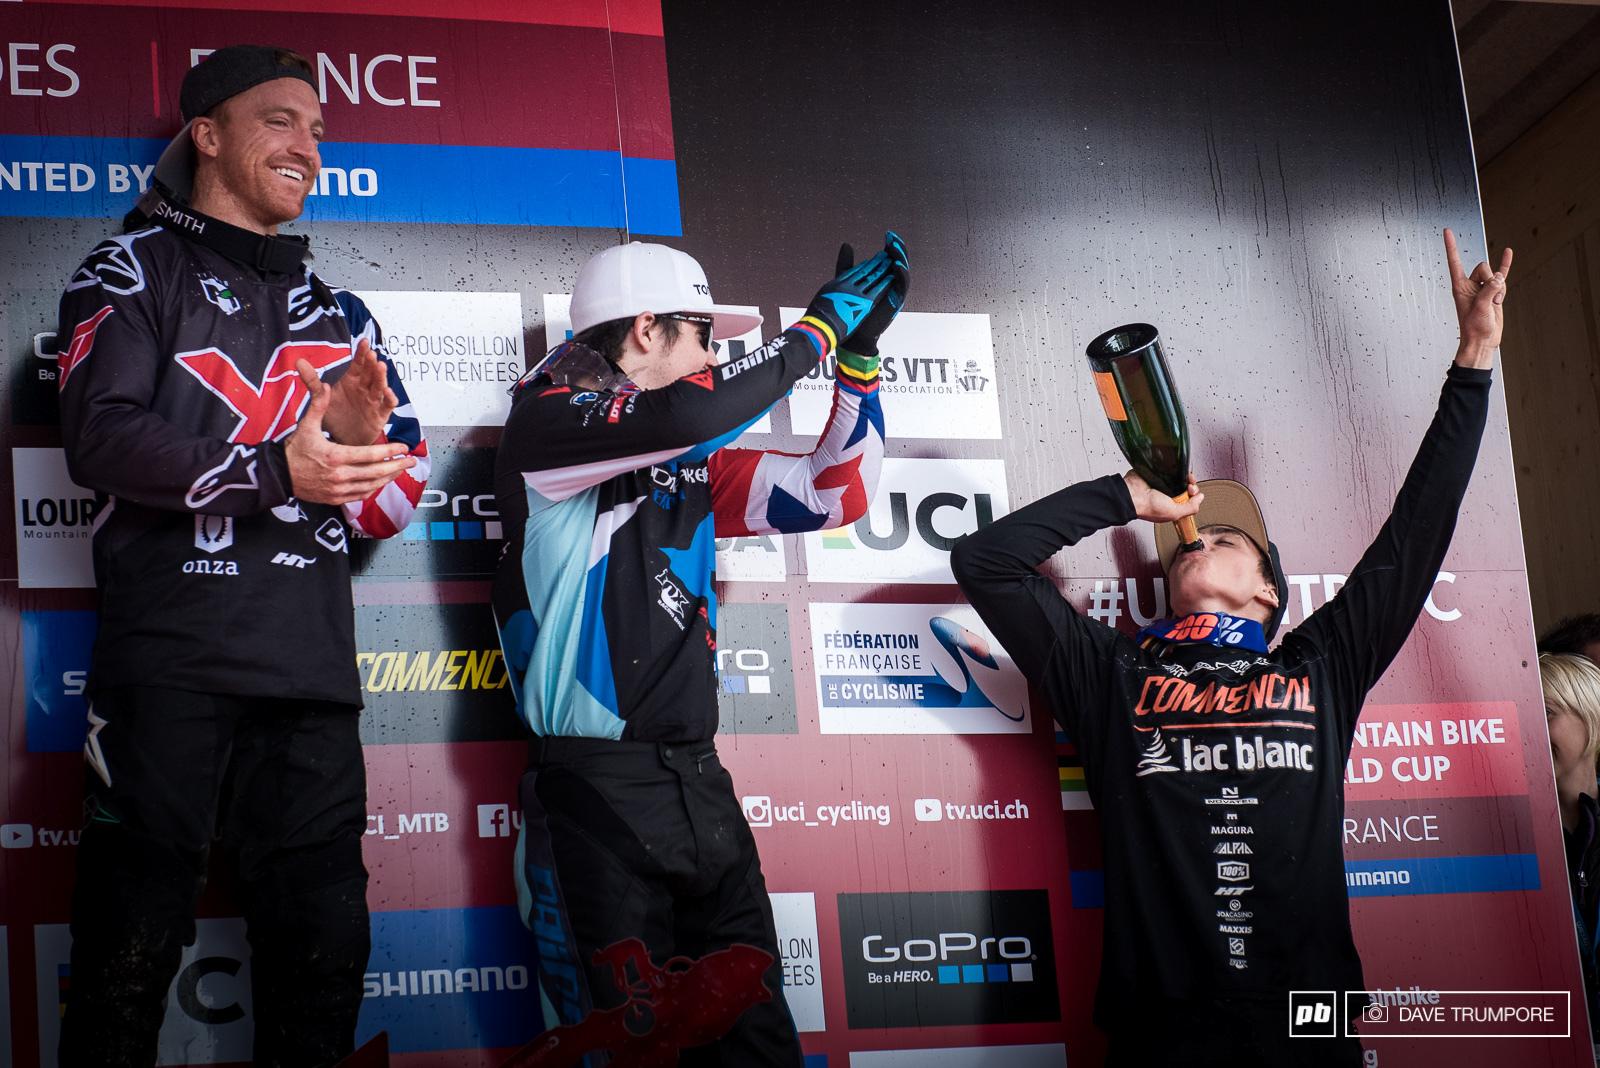 Welcome to the podium Amaury Pierron.